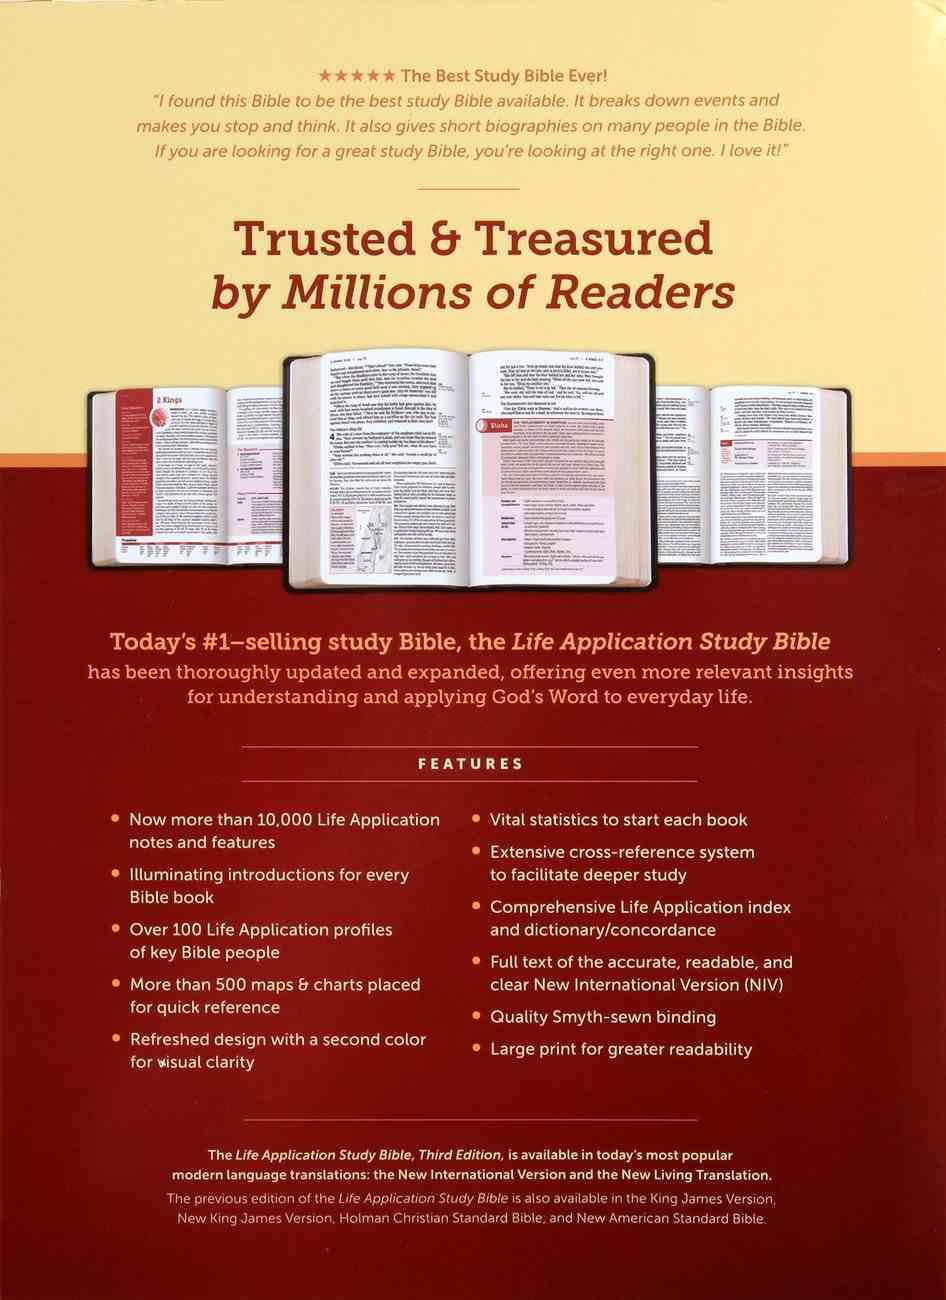 NIV Life Application Study Bible 3rd Edition Large Print (Red Letter Edition) Hardback